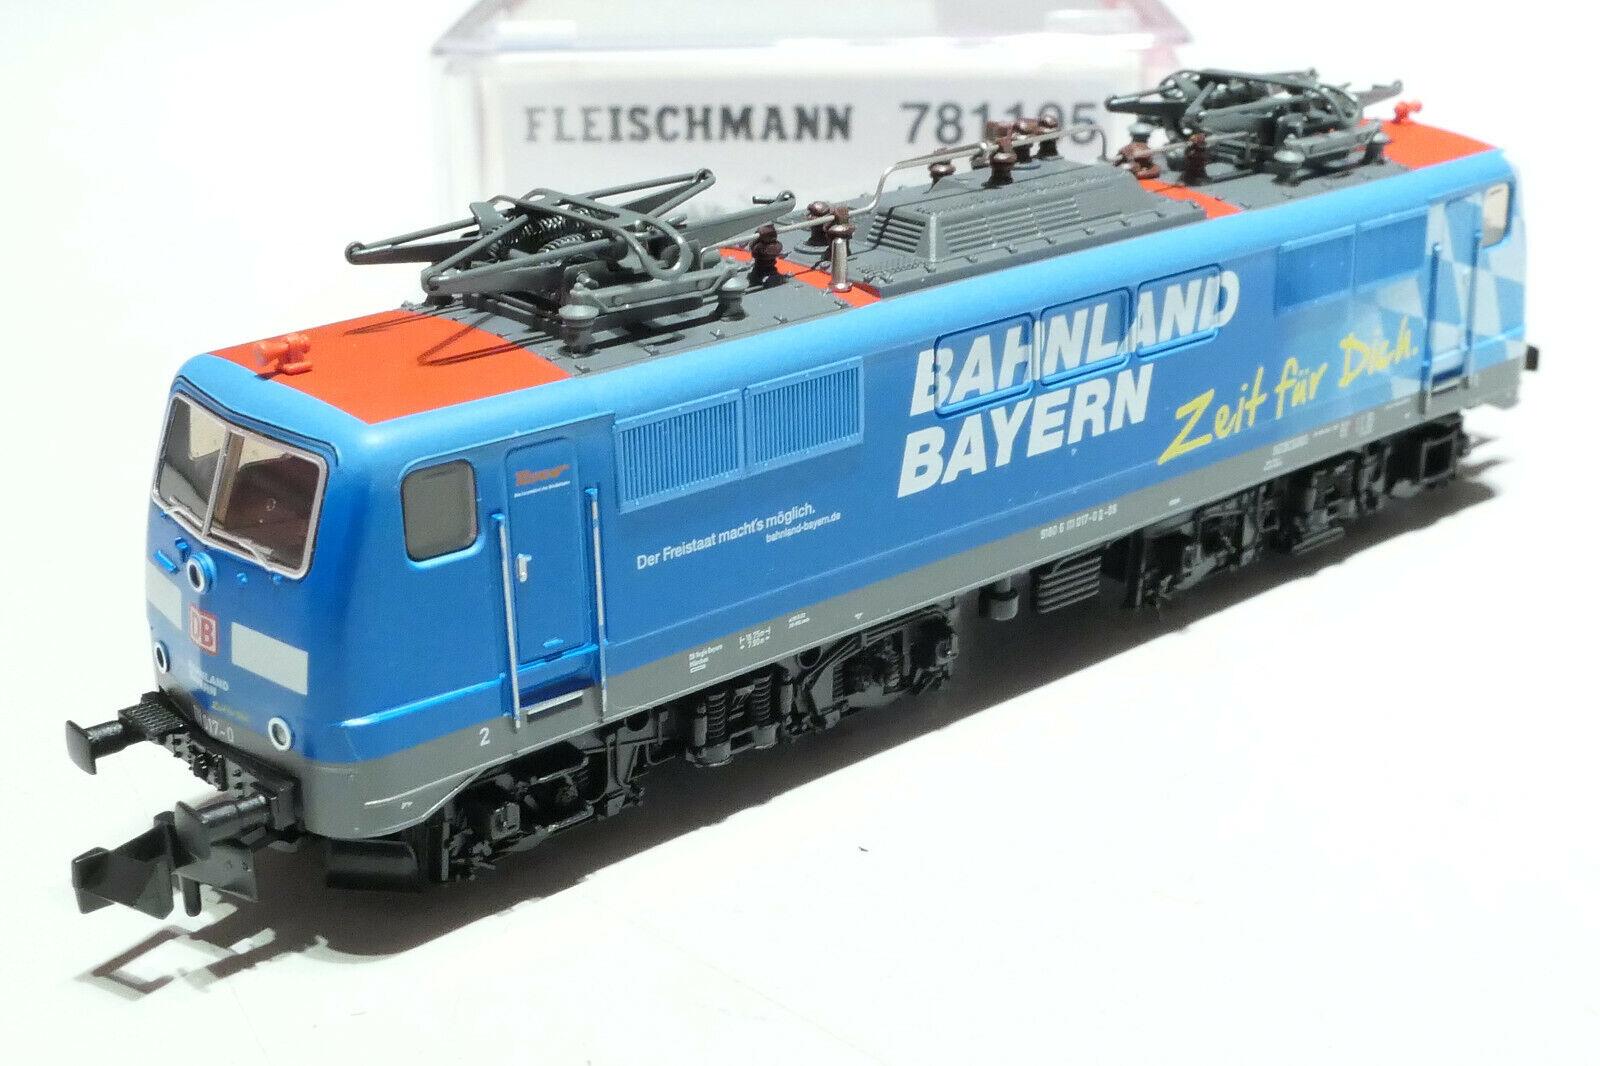 Fleischuomon N DB AG 111 1170 ferrovia paese Baviera ColoreeeATO 781105 NUOVO OVP